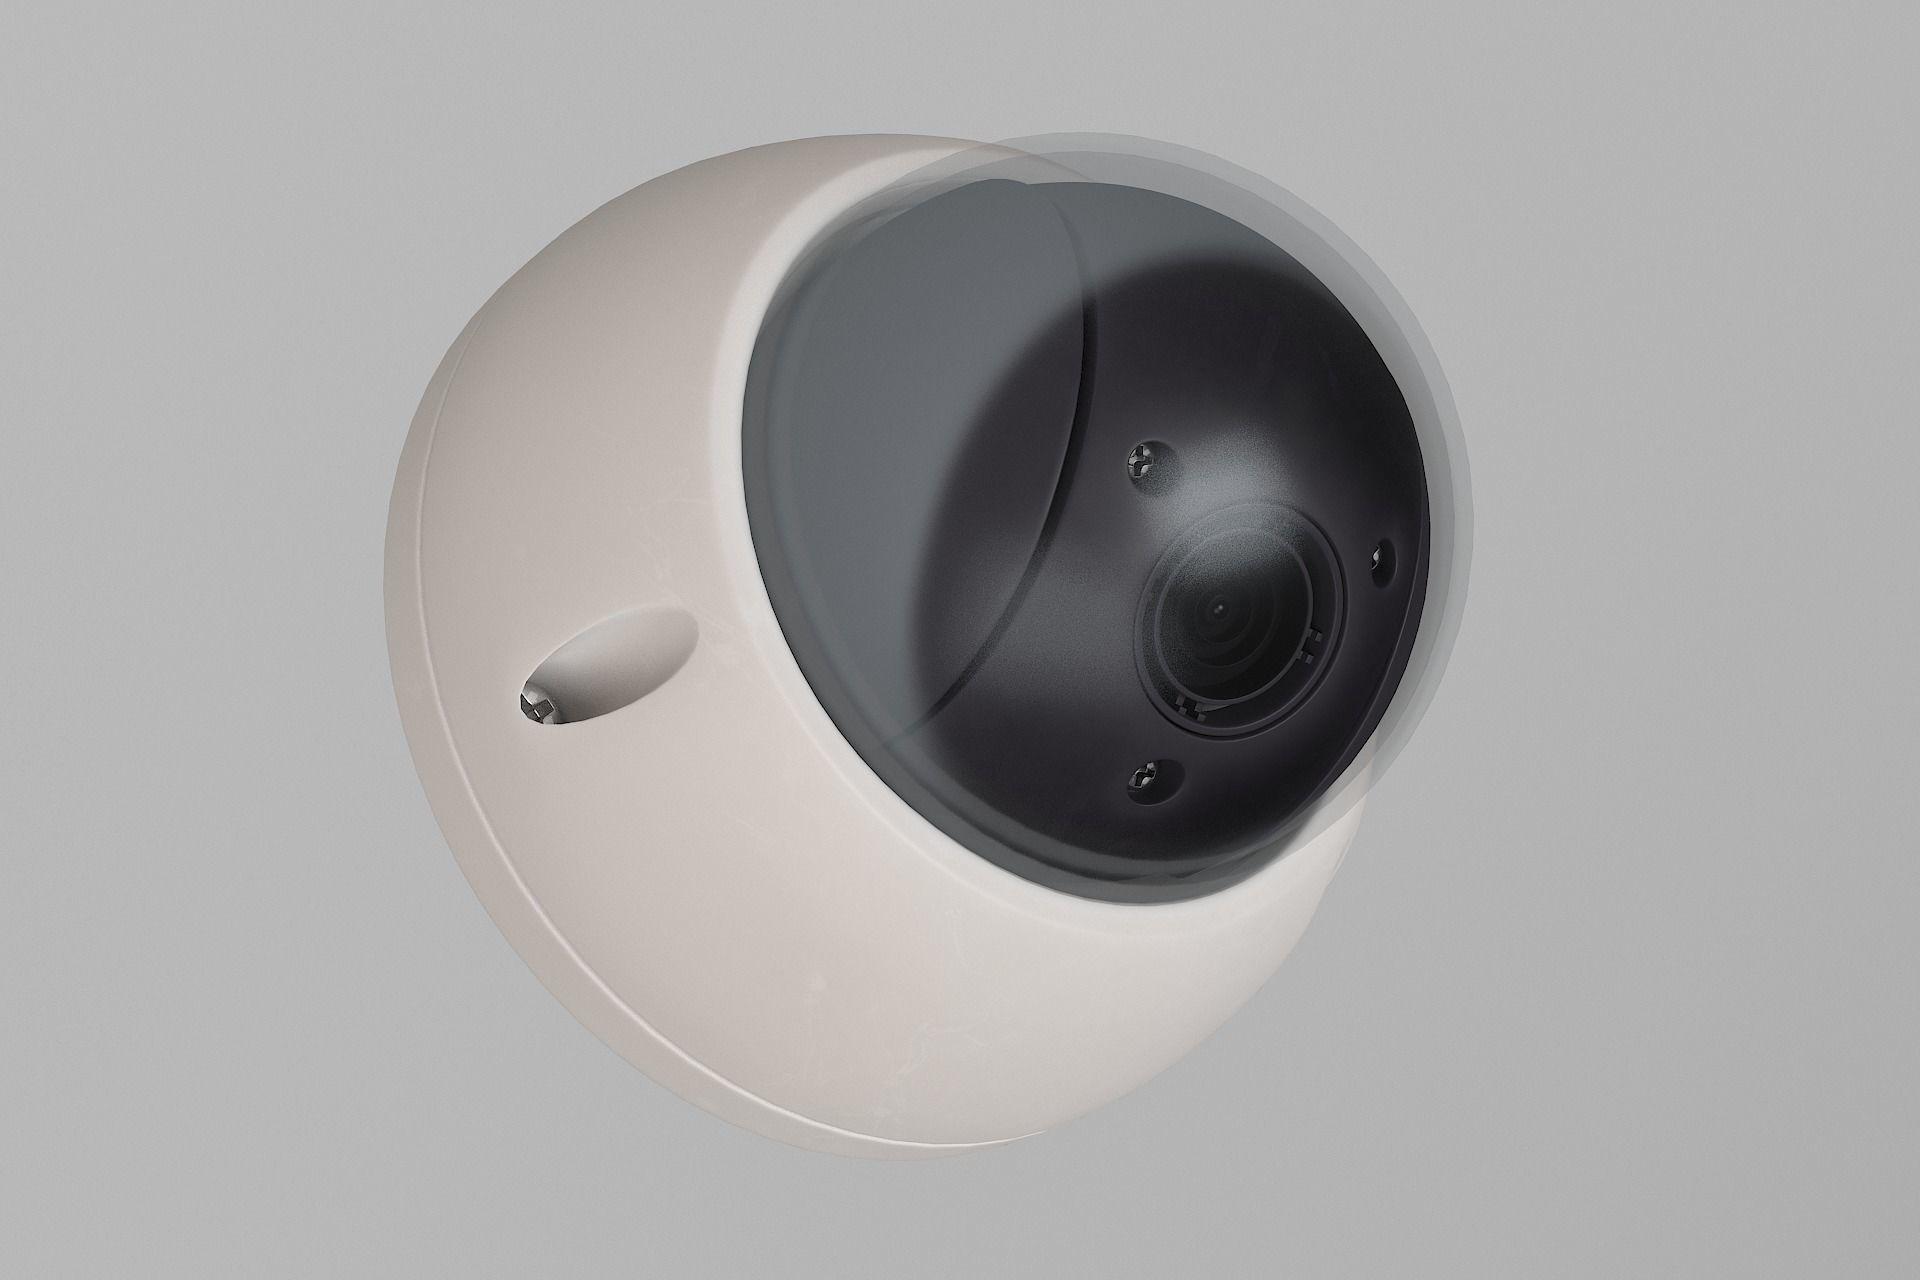 Dahua SD22204T surveillance camera